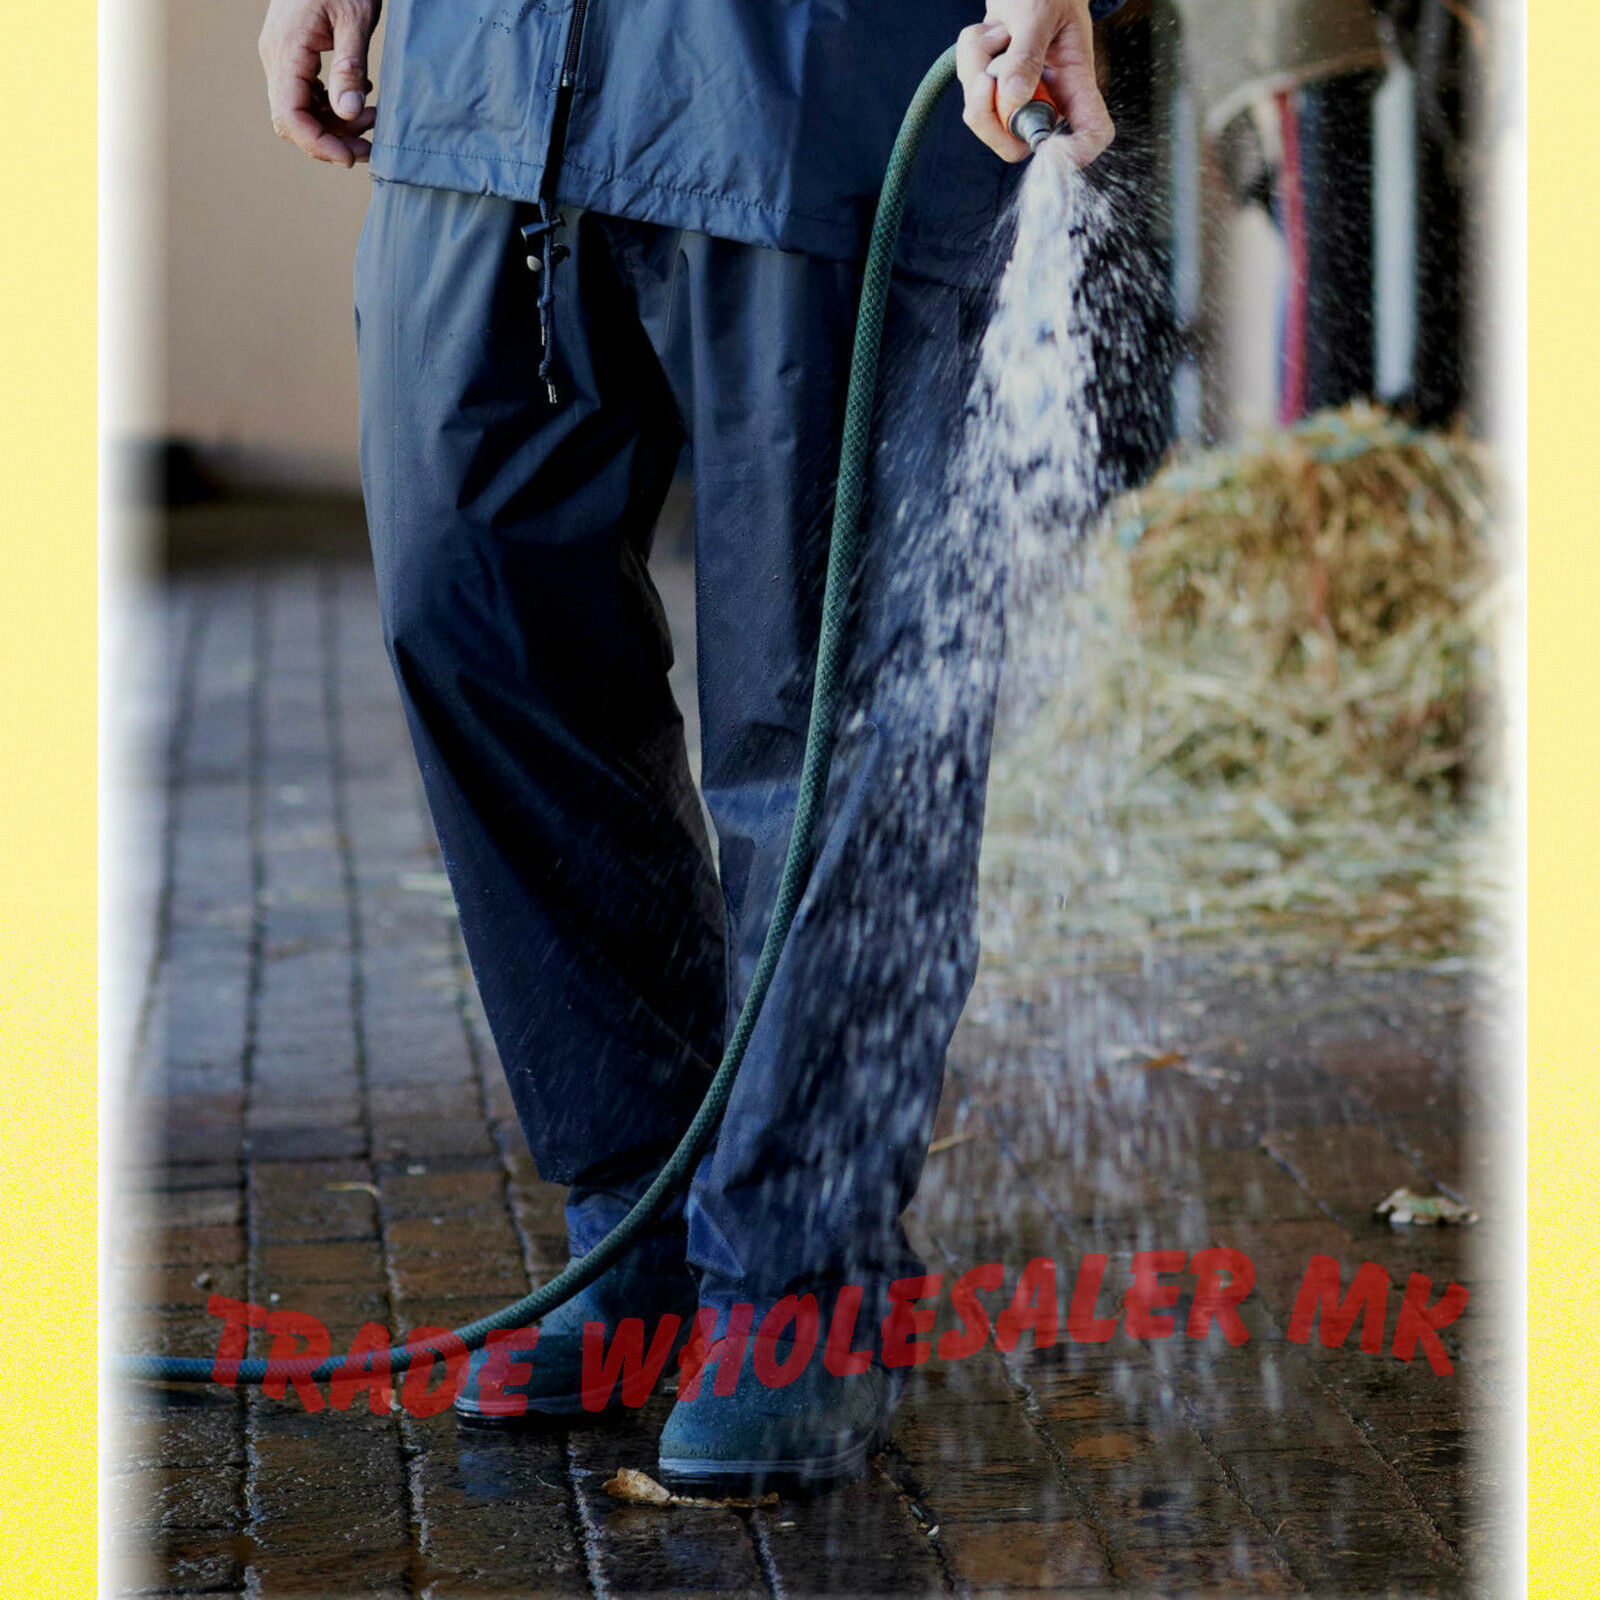 WWK Waterproof Over Trouser rain fishing work storm legging Mens Womens NEW